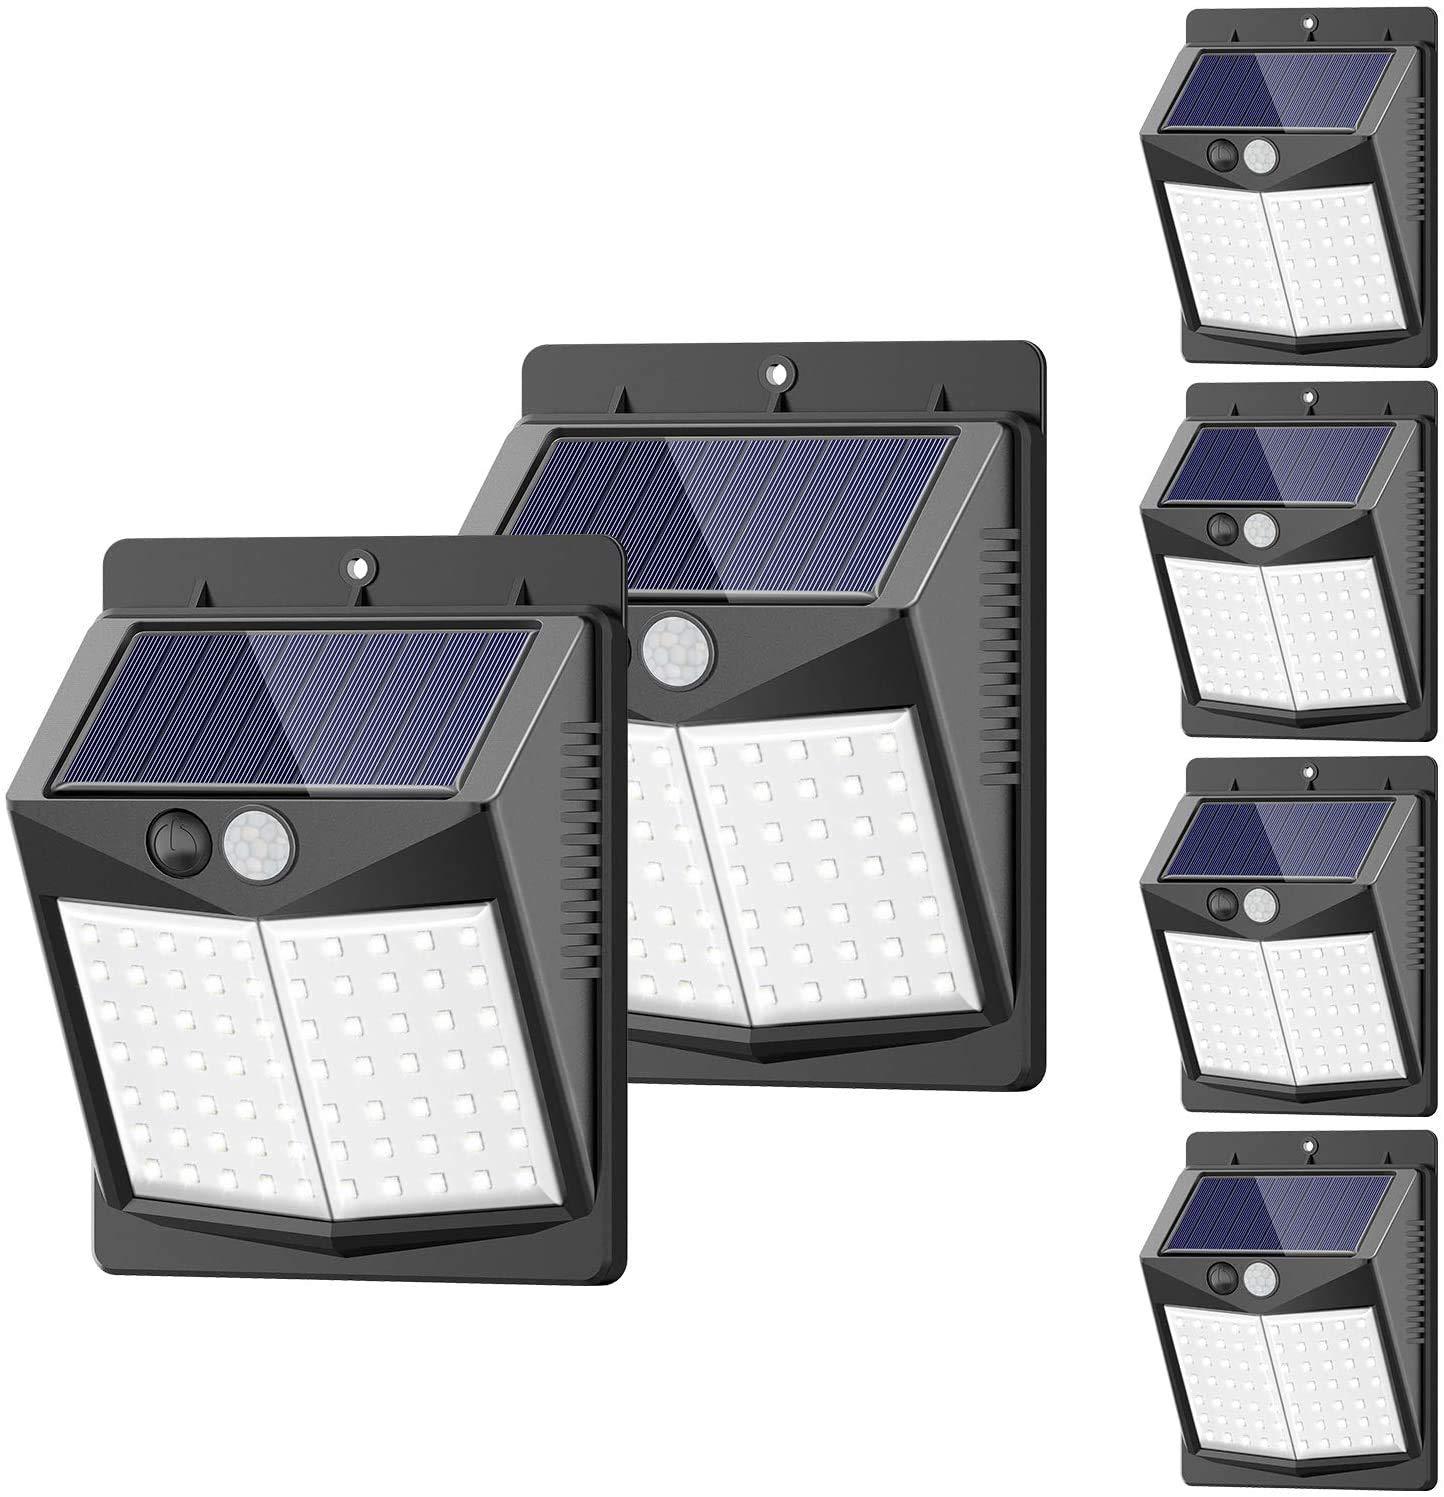 Solar Lights Outdoor, [6 Pack/3 Modes/50LED] SEZAC Motion Sensor Security Lights Solar Security Lights IP 65 Wireless Waterproof Outdoor Lights for Garden Patio Yard Deck Garage Fence Pool